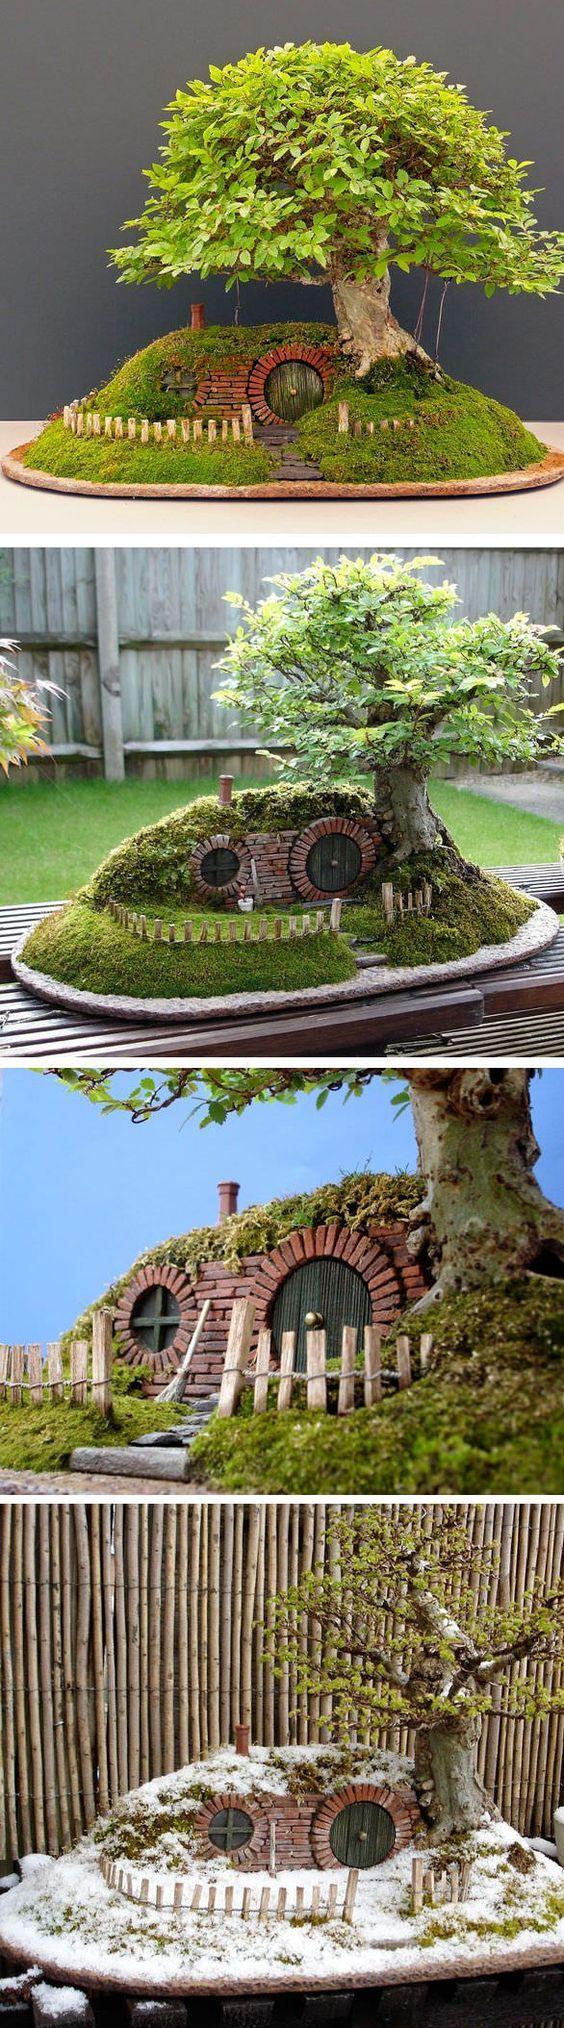 14 Fairy Garden Ideas For Kids At Heart - Hit DIY Crafts: